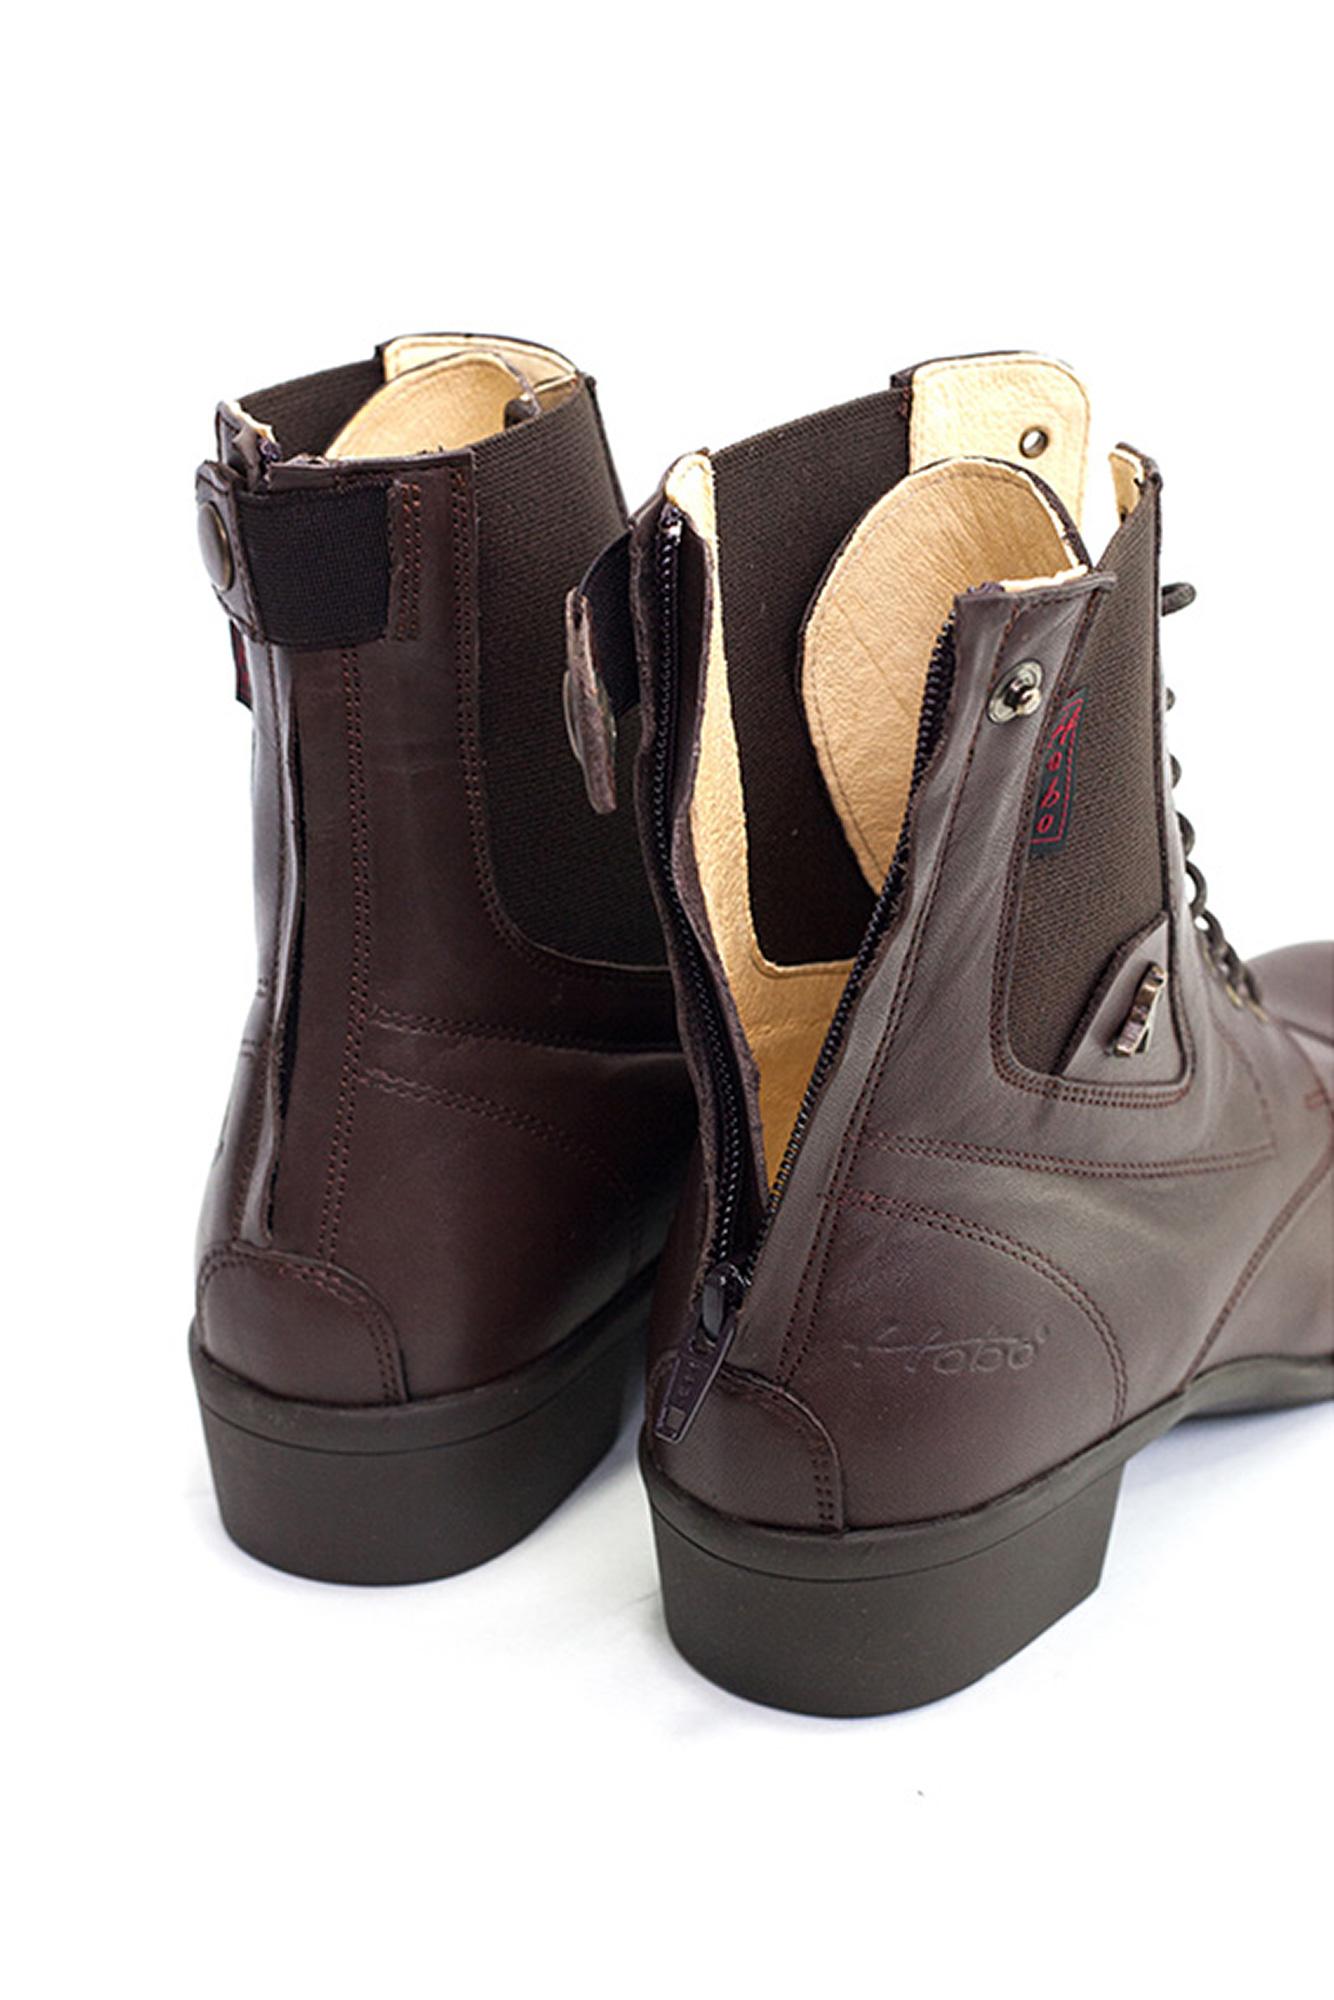 Hobo Brown Shoes